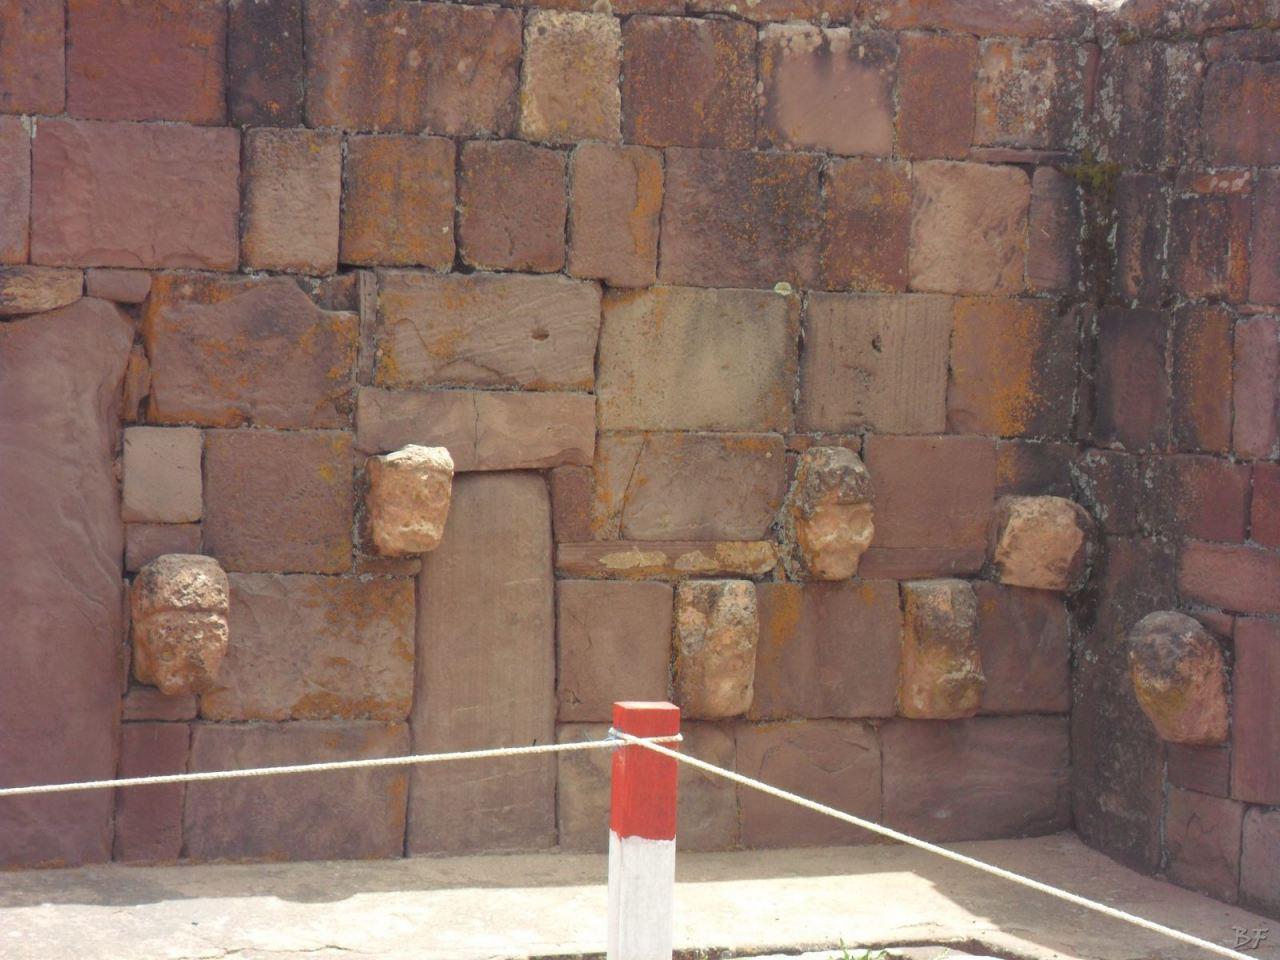 Sito-Megalitico-Piramide-Akapana-Kalasasaya-Menhir-Tiahuanaco-Bolivia-97